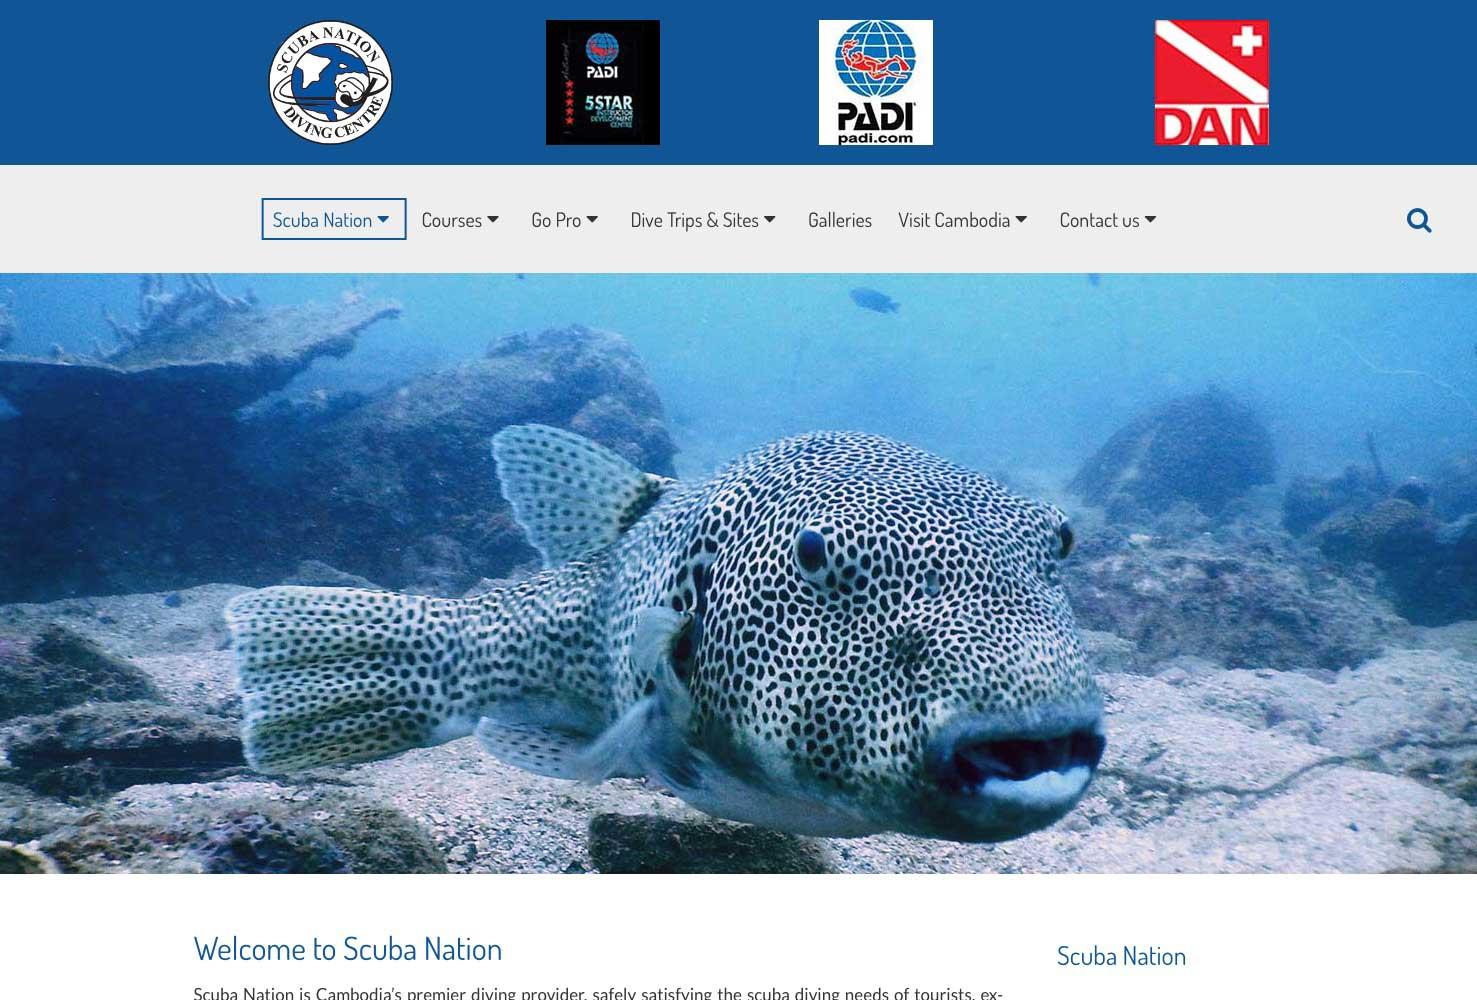 Scuba Nation